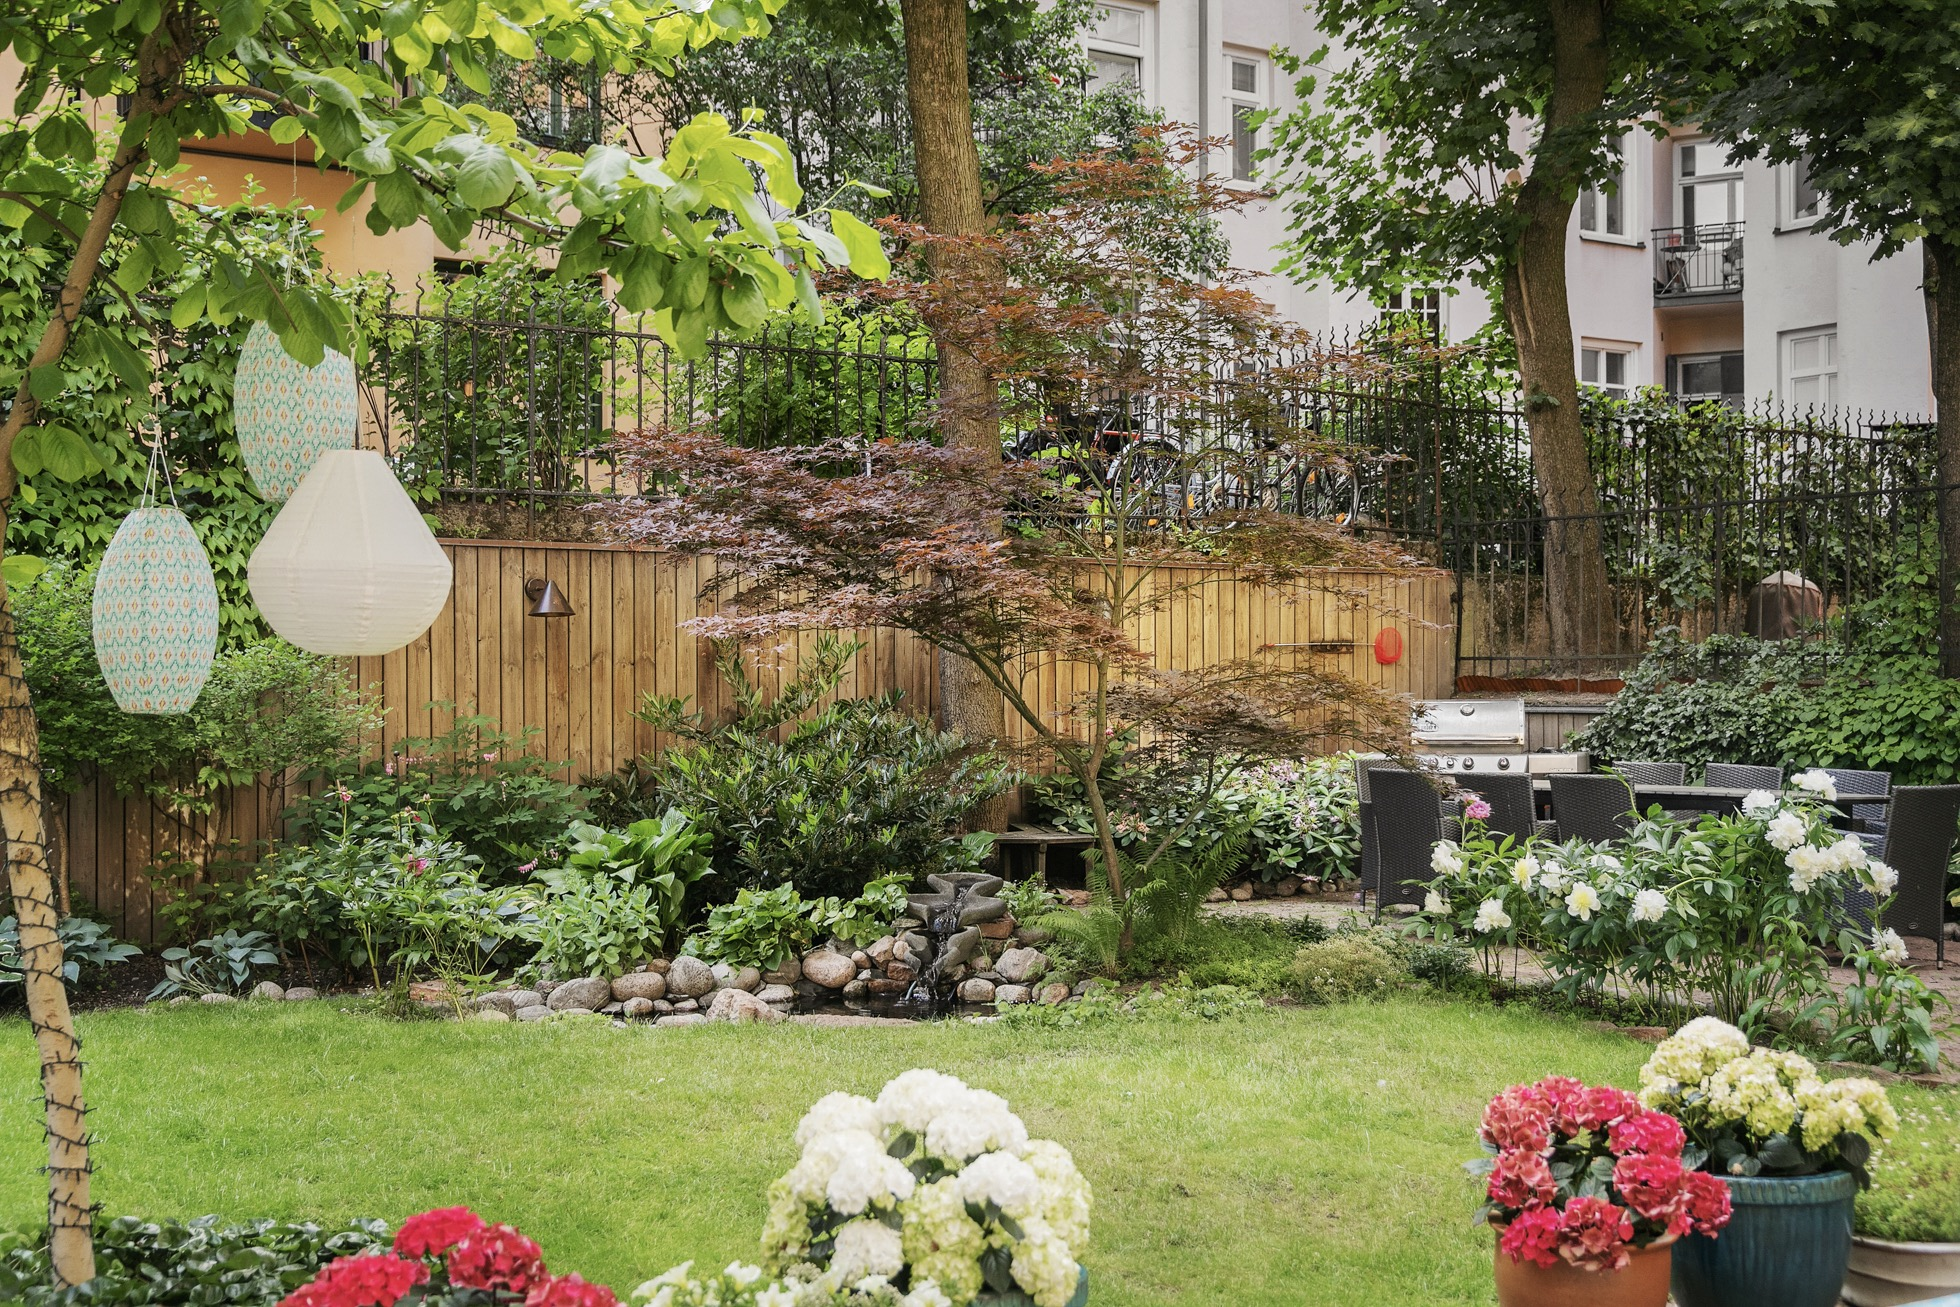 двор сад забор клумба